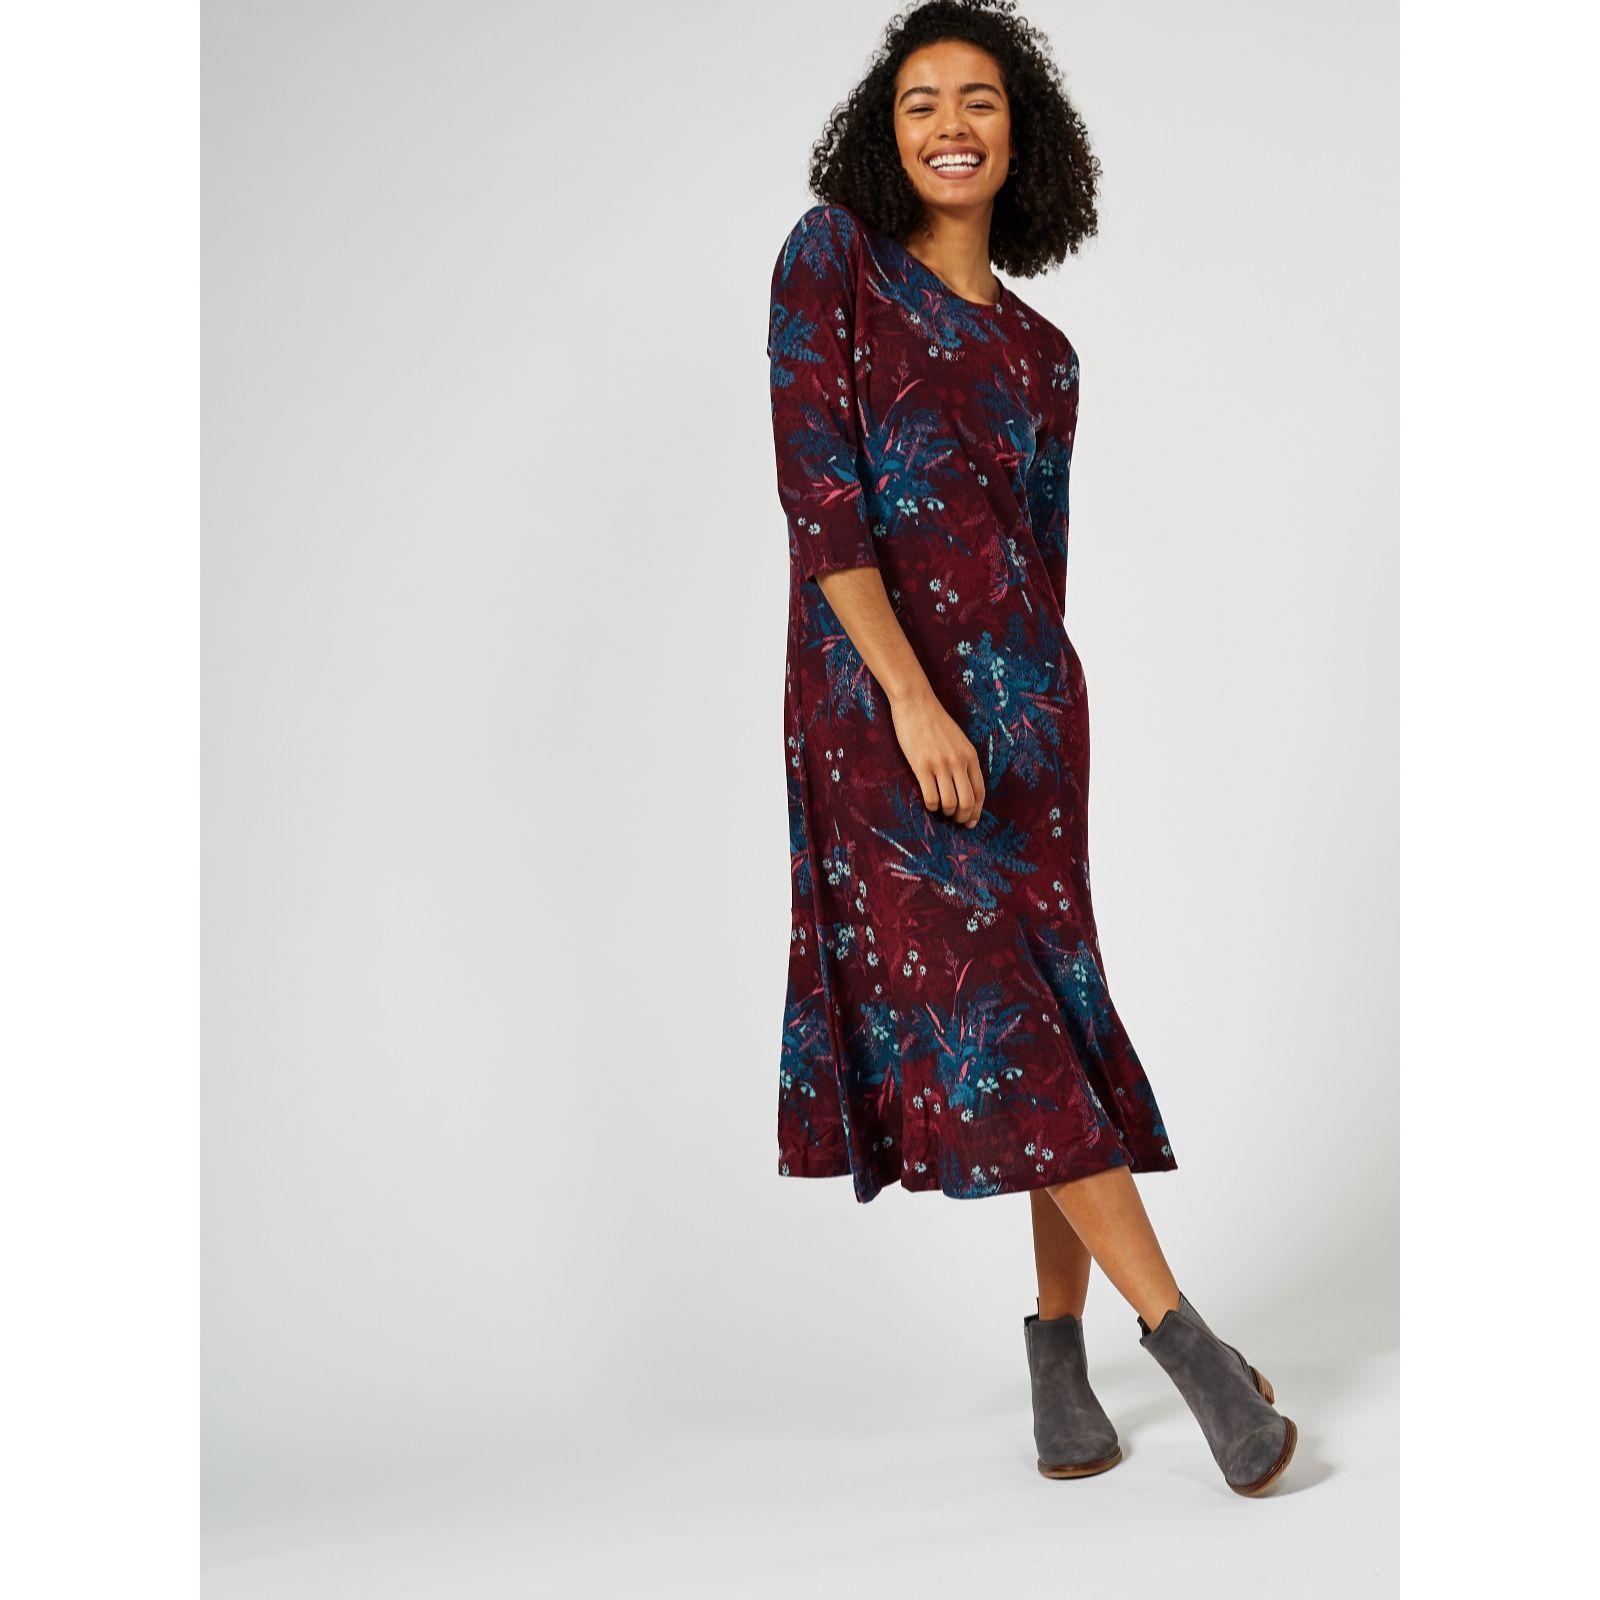 c849f5d6cf3 Denim   Co. Printed Brushed Heavenly Jersey Midi Dress - QVC UK